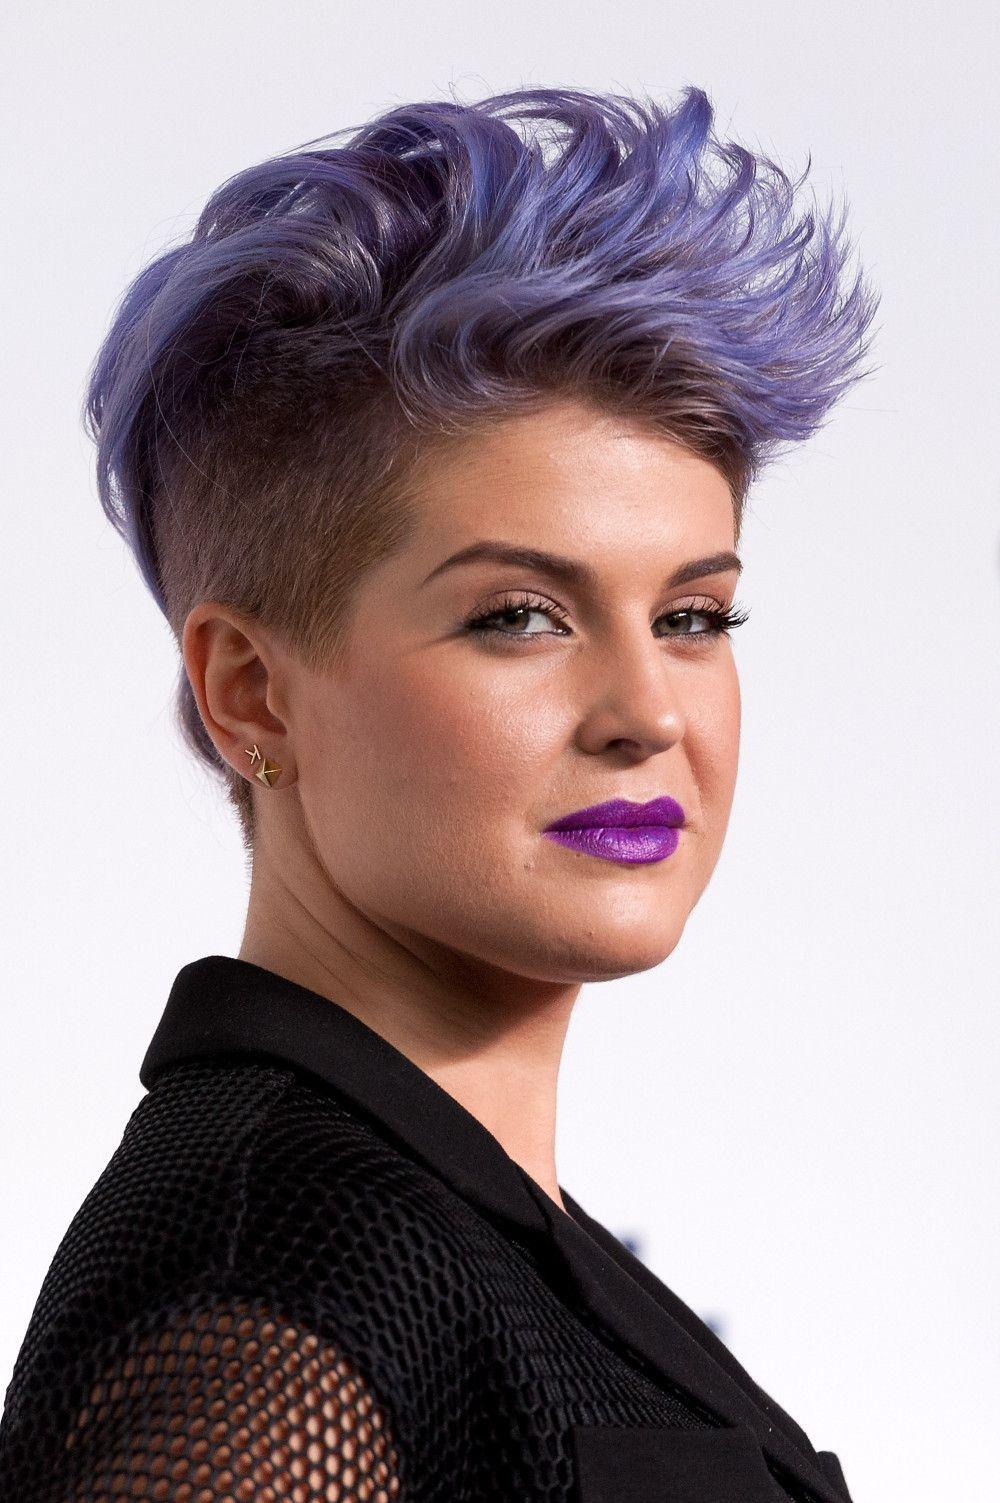 20 chic pixie hairstyles for short hair | kelly osbourne, hair